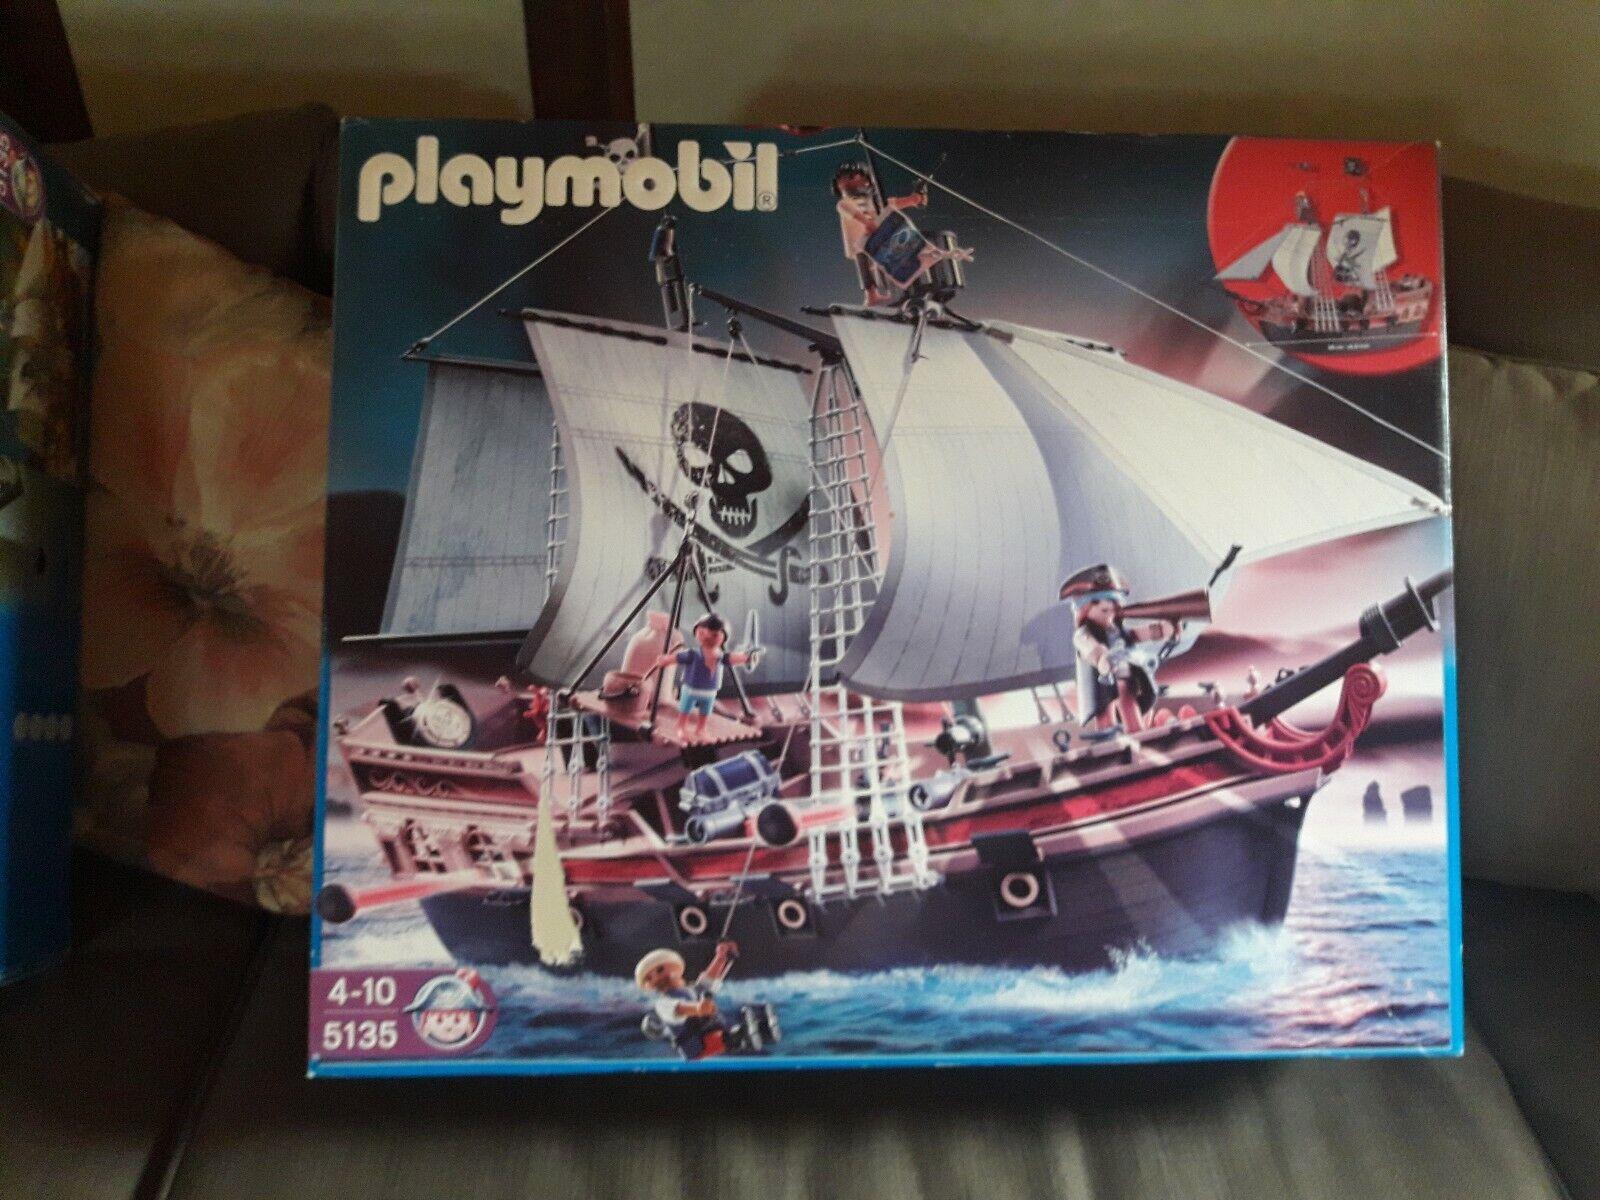 al prezzo più basso Playmobil 5135 5135 5135 Neuf bateau Playmobil boite abime  basta comprarlo